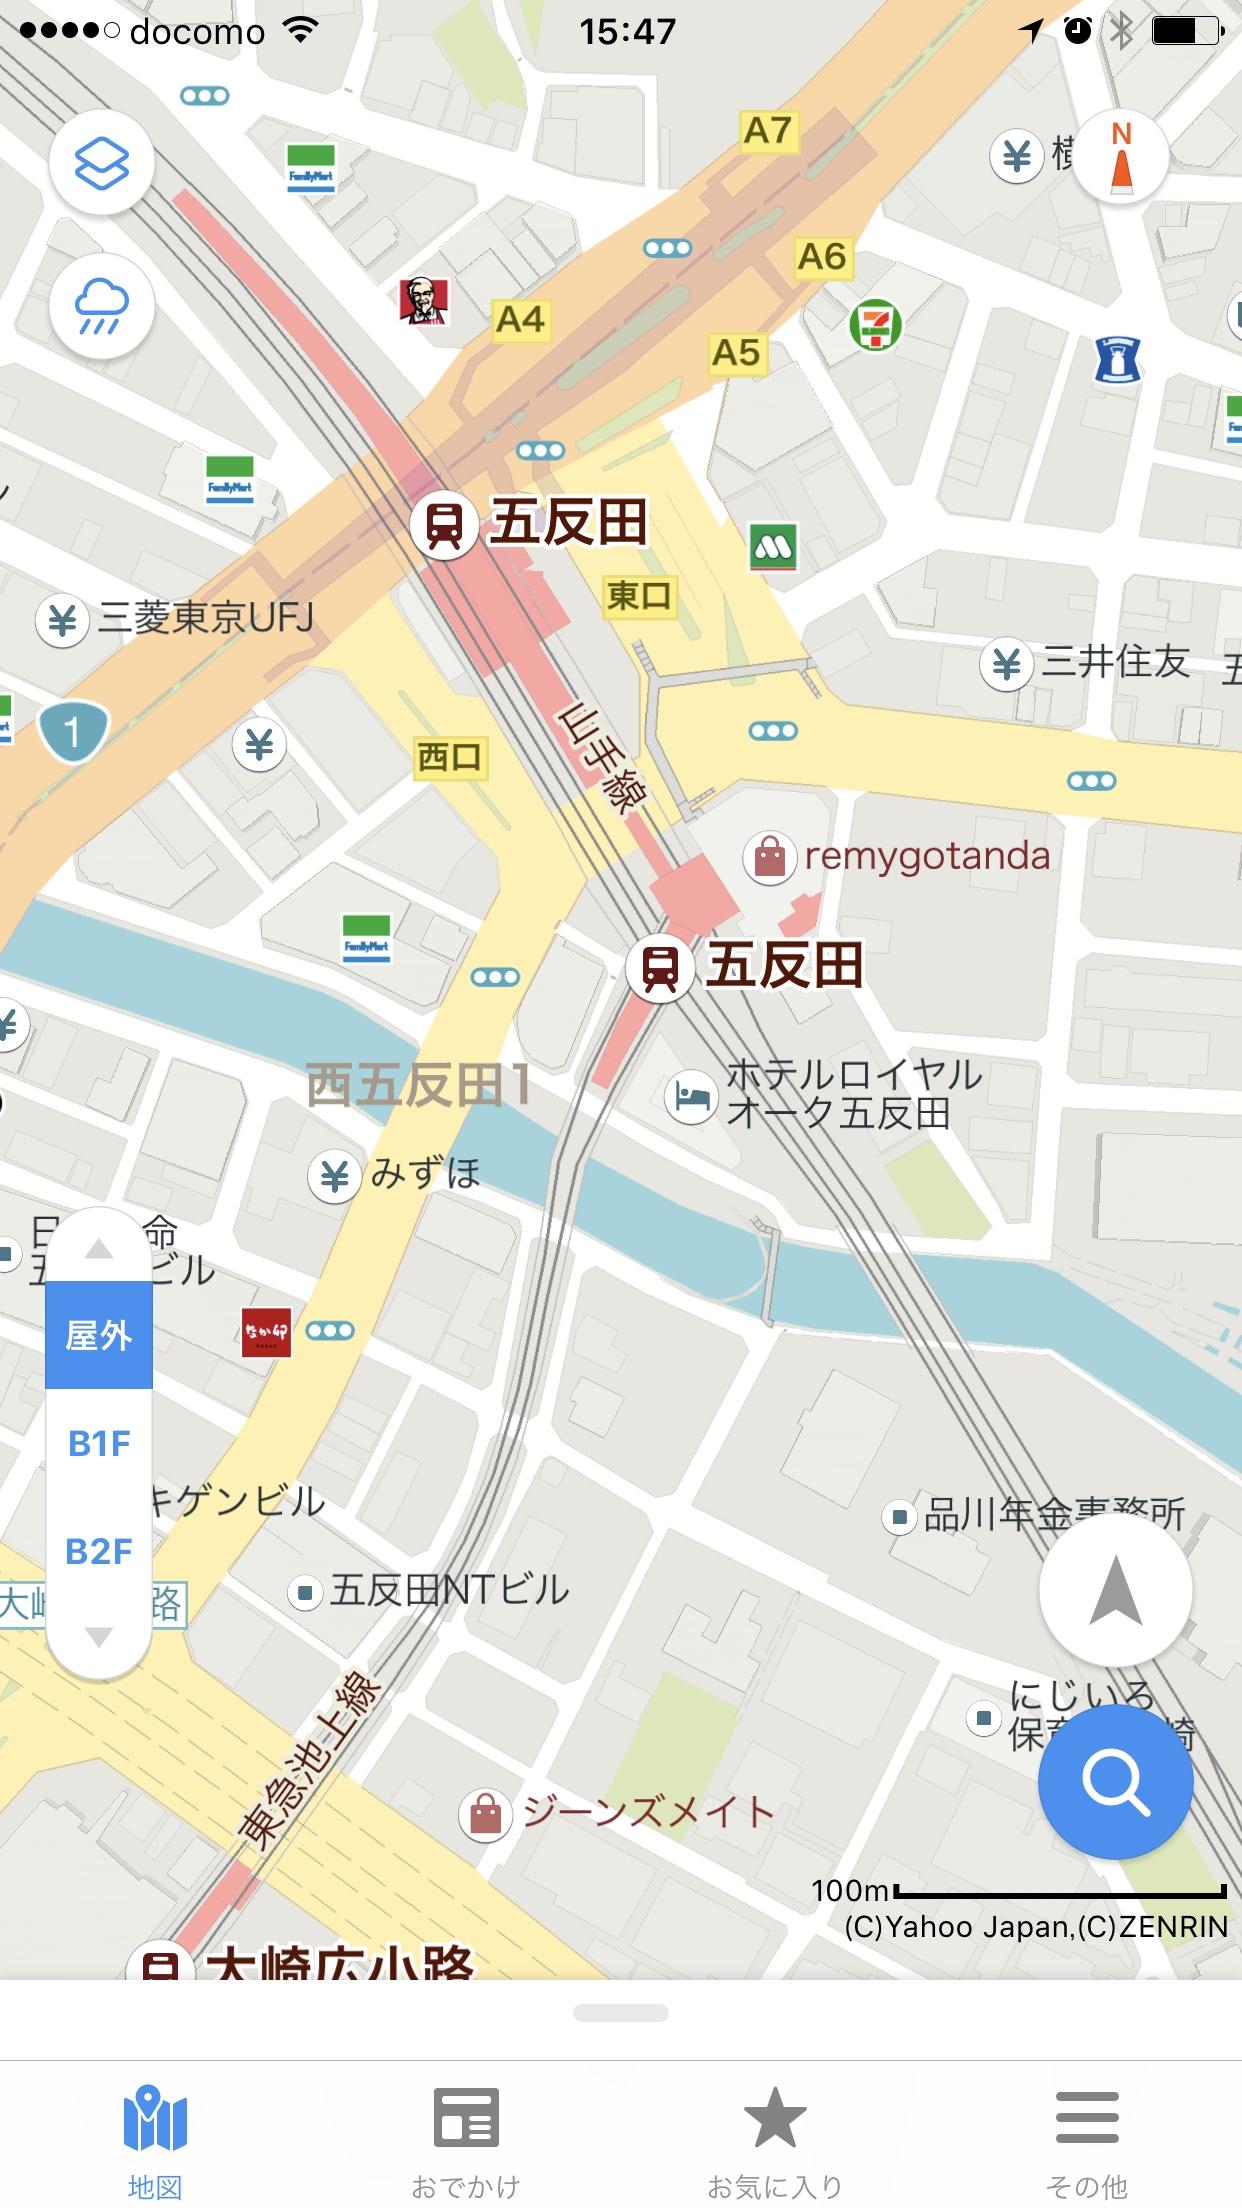 Yahoo Japan MAP v5 Gotanda Station, notice the indoor mapping UI in the lower left corner.